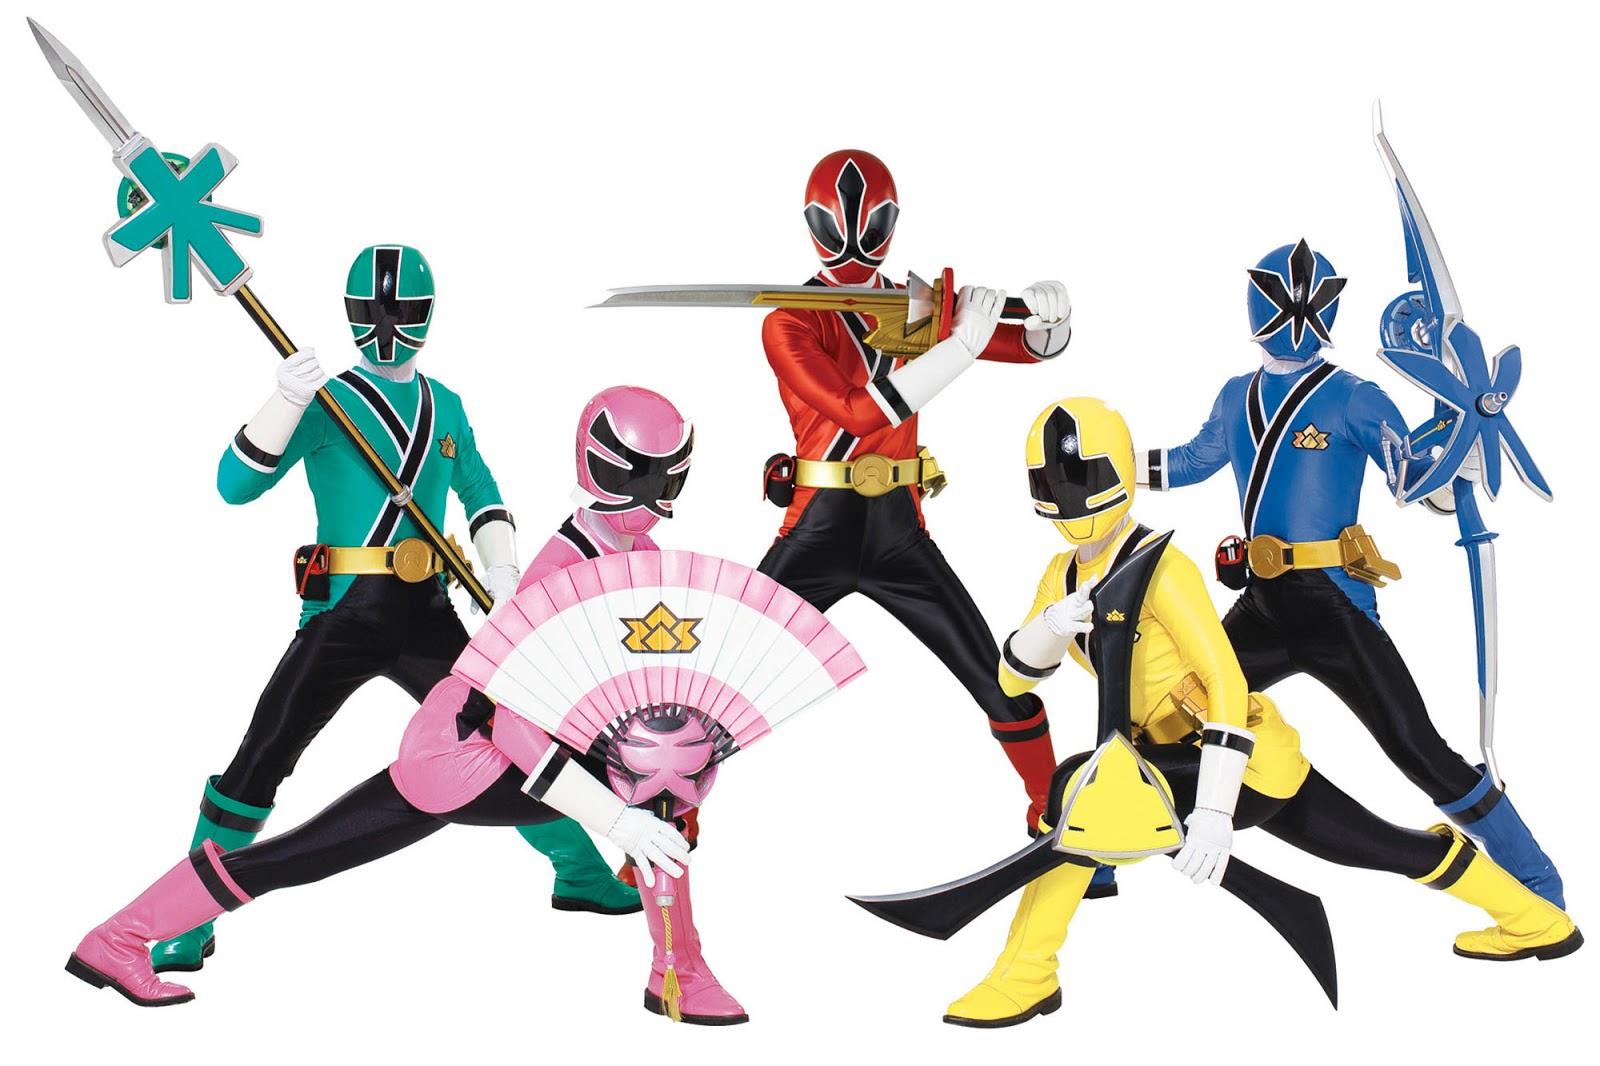 Atractivo Rangers Imprimibles De Poder Para Colorear Embellecimiento ...